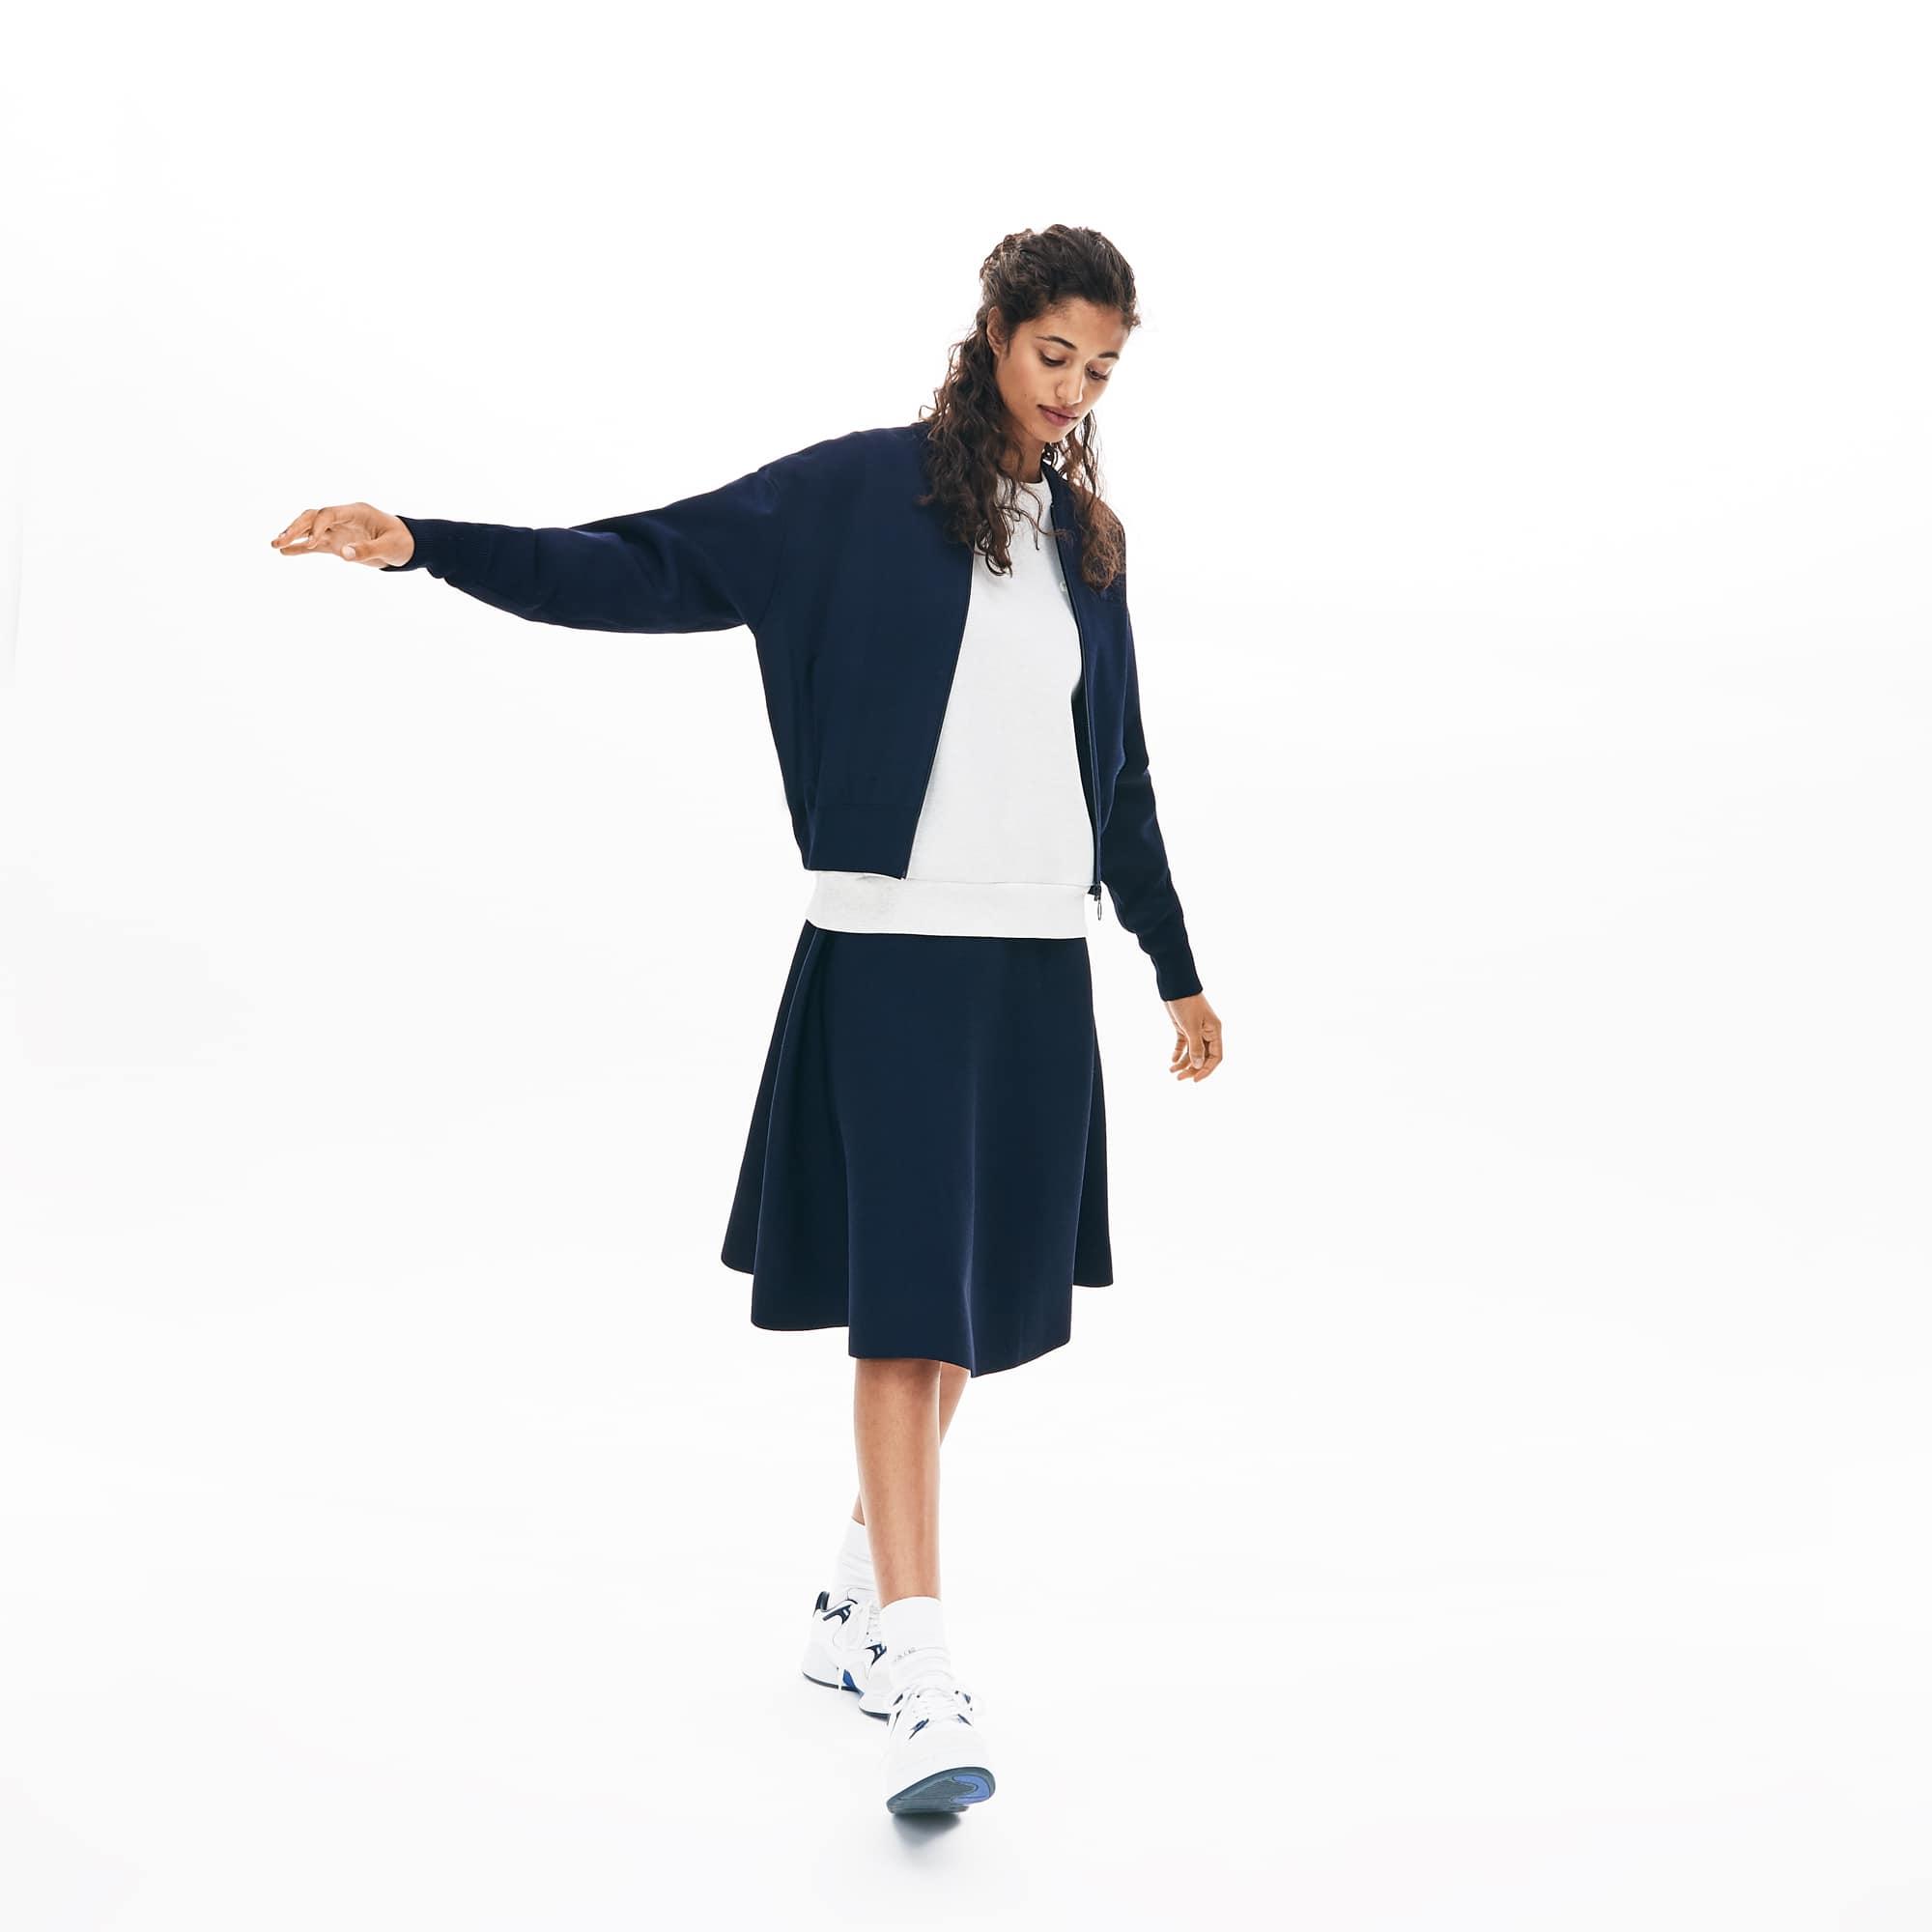 Lacoste Dresses Women's Cropped Zip-Front Cardigan